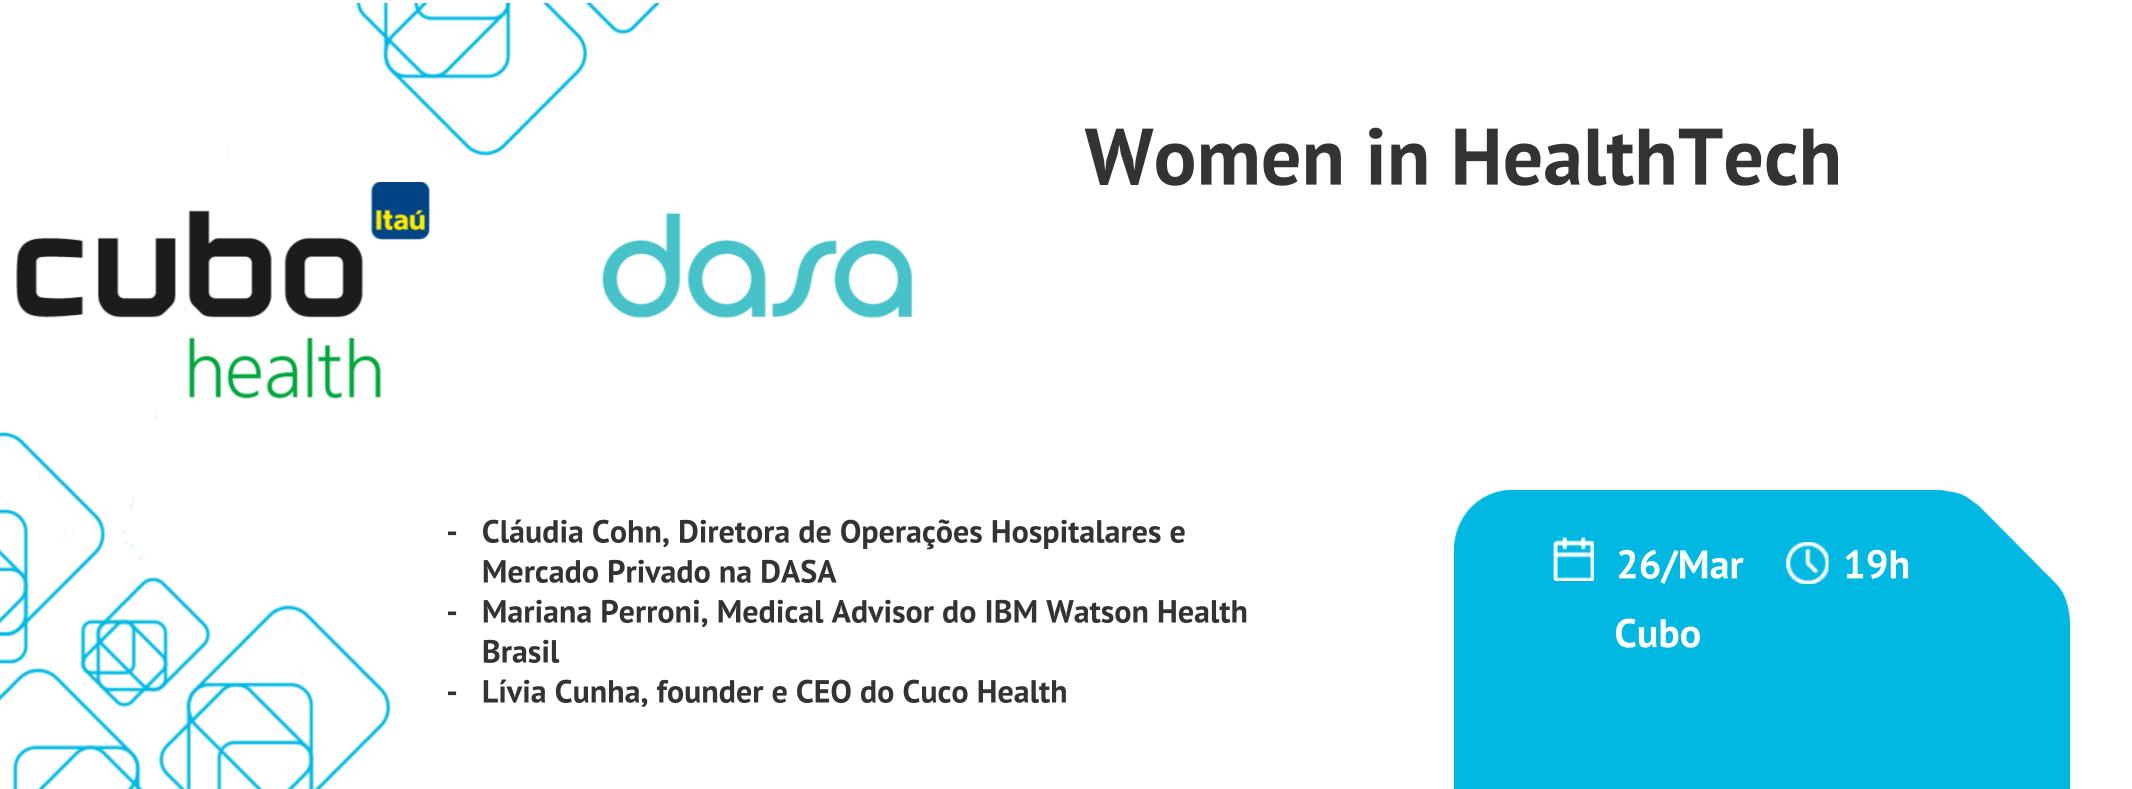 sympla.com.br - #CuboHealth - Women in HealthTech